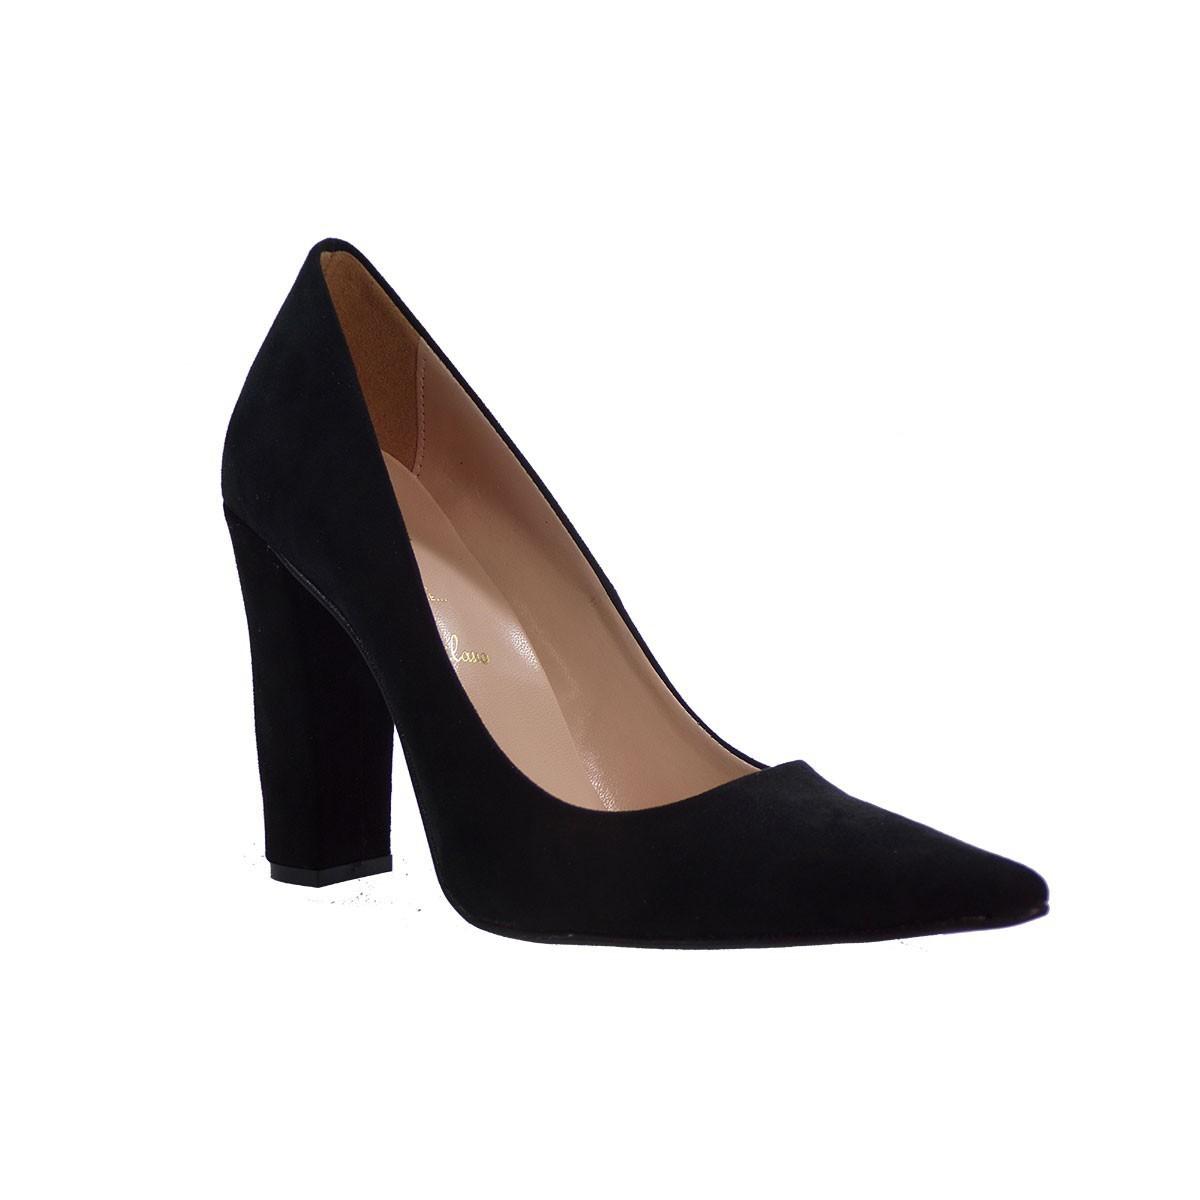 Alessandra Paggioti Γυναικεία Παπούτσια Γόβες 89002 Μαύρο Καστορί